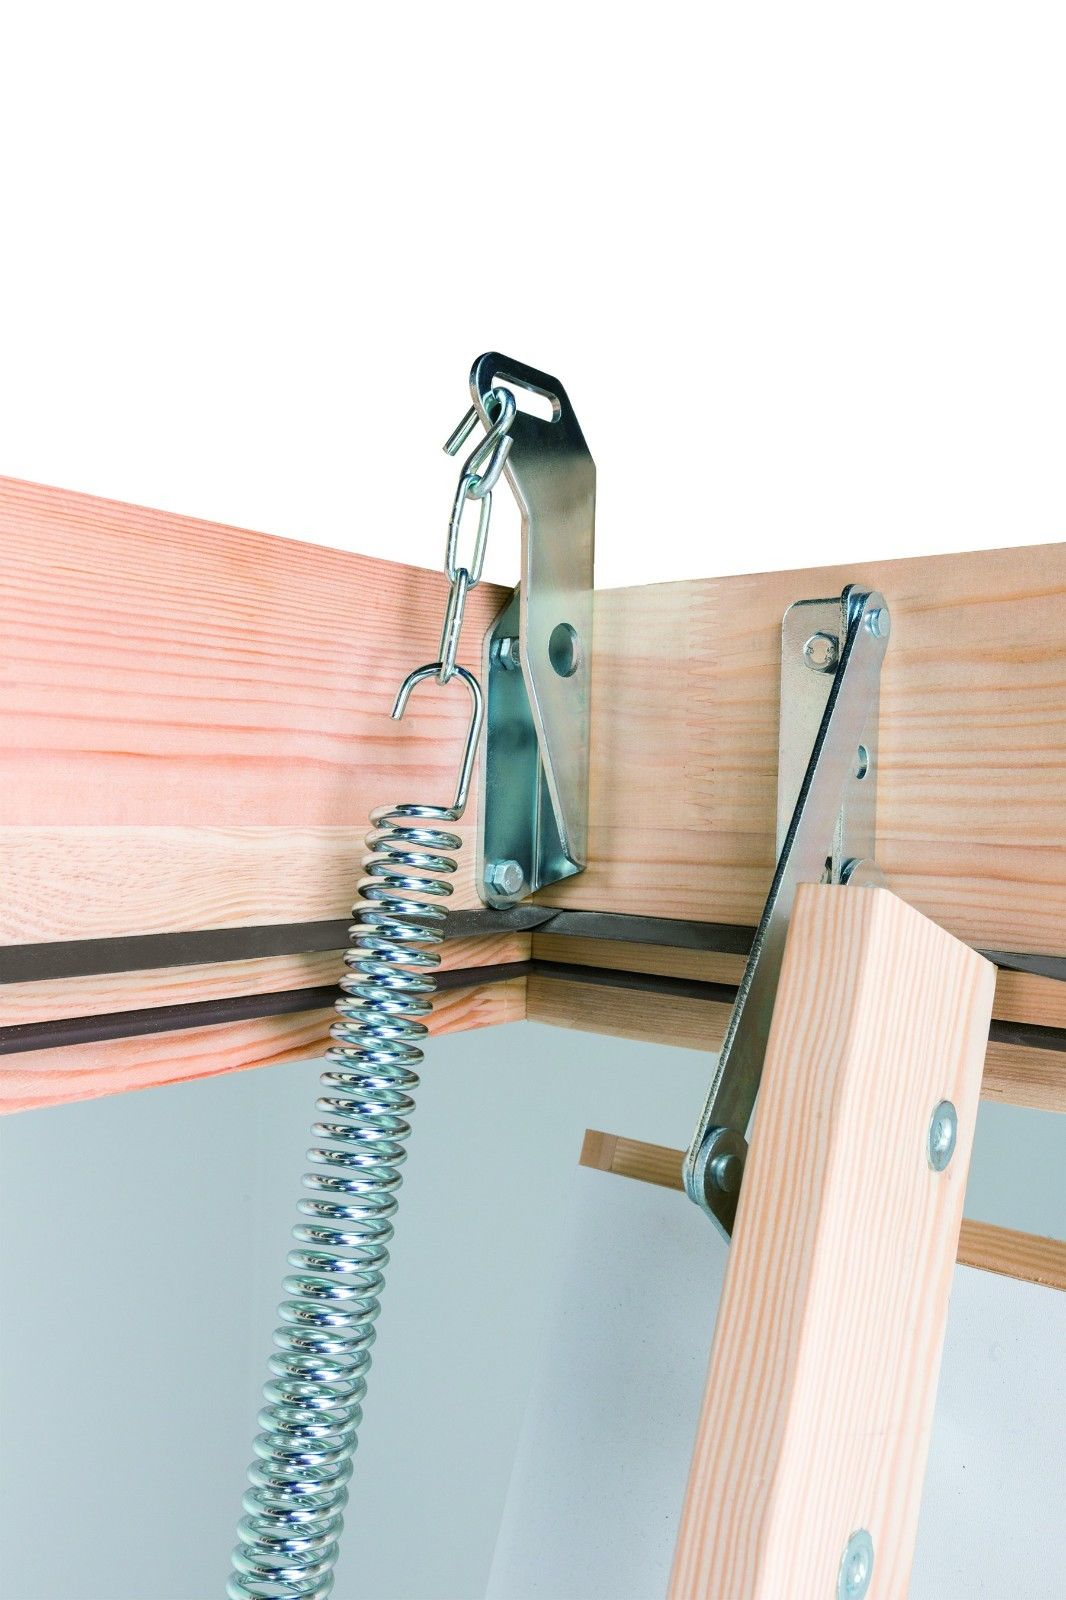 Optistep Loft Ladder Amp Hatch 70cm X 120cm Ak Roof Windows